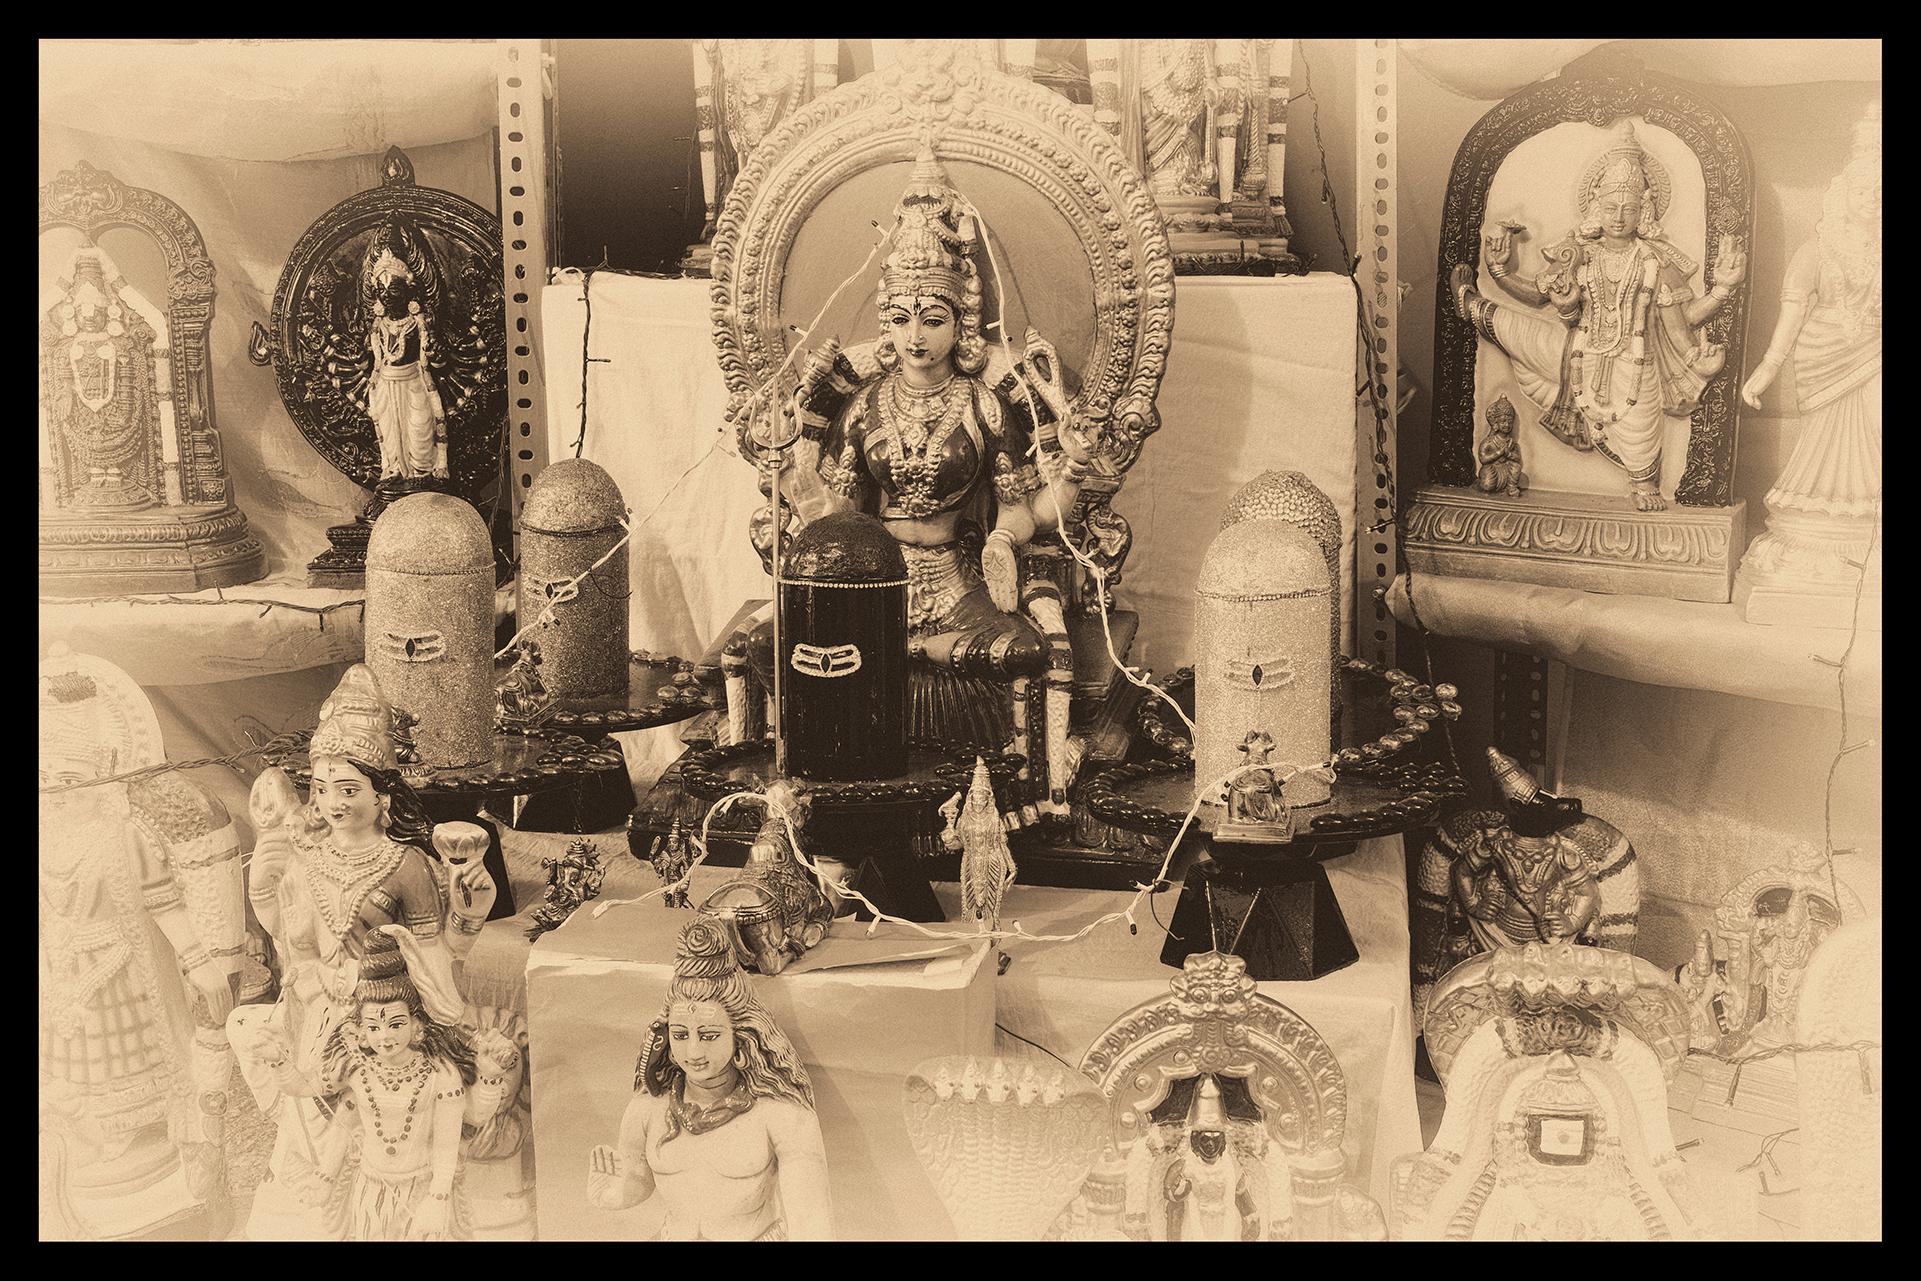 Kolu Images